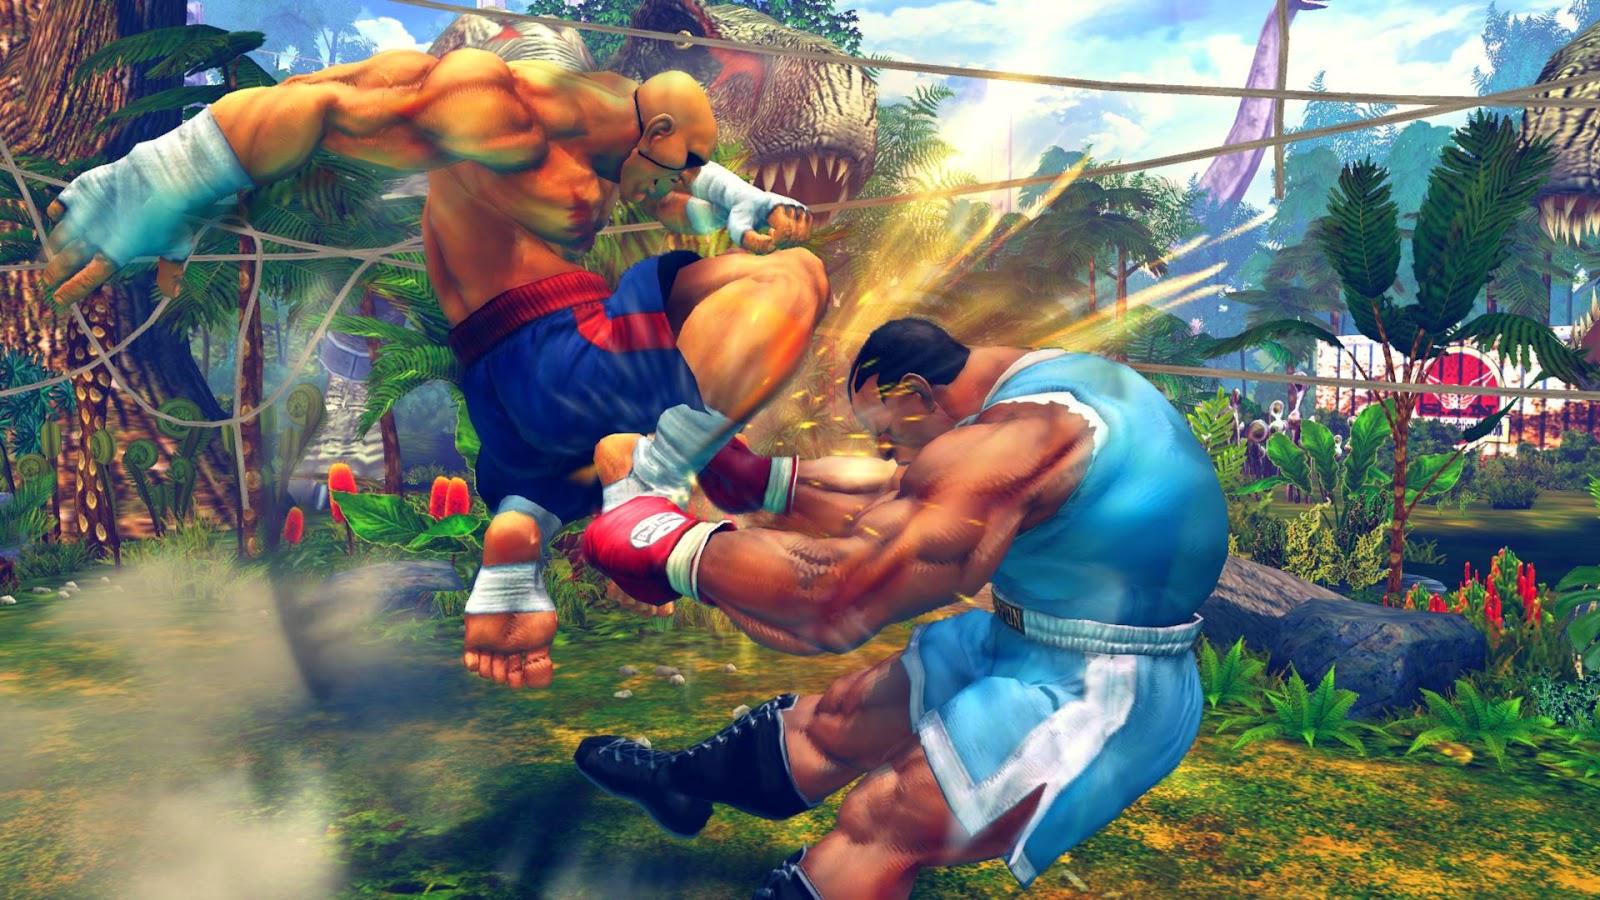 Ultra Street Fighter IV Update.09 Incl DLC Pack 1-reloaded Major, league, baseball 2K9 Students for Sensible Drug Policy at Sierra